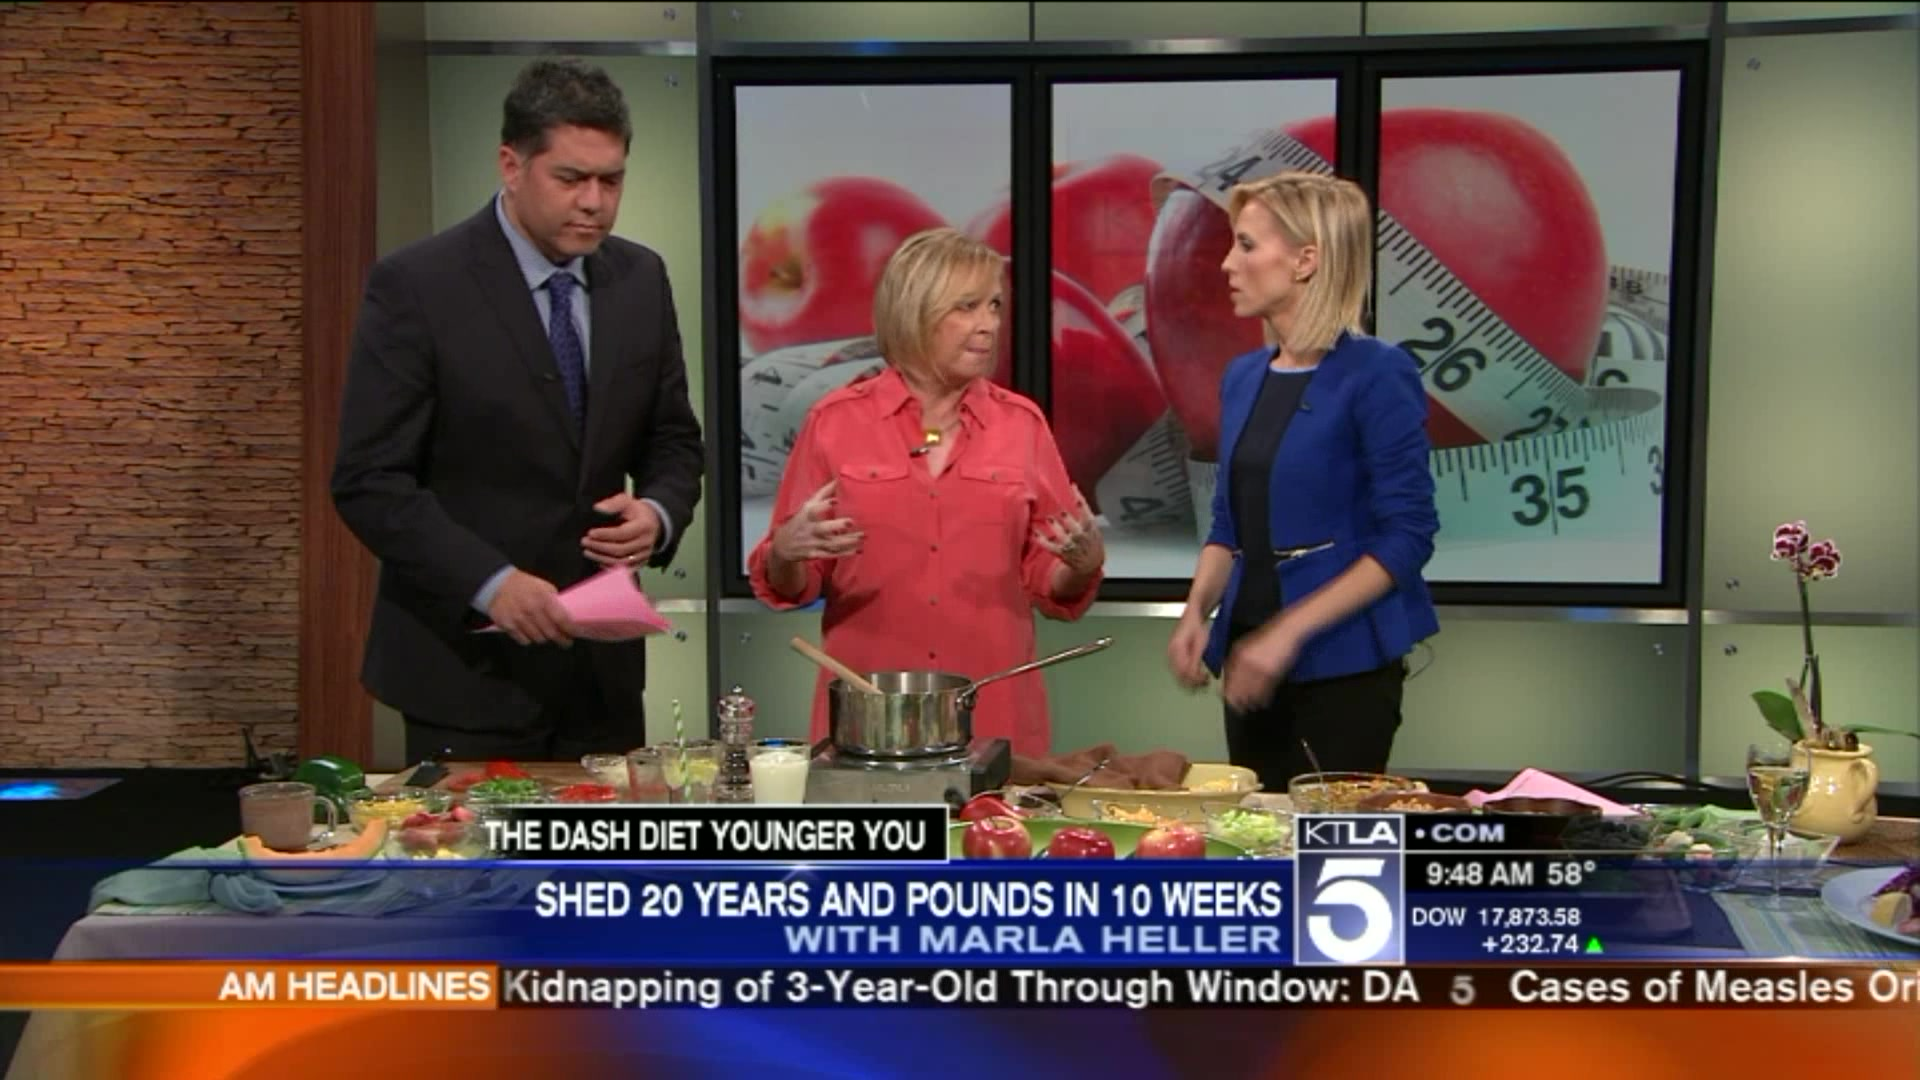 6 Delicious DASH Diet Meal Ideas